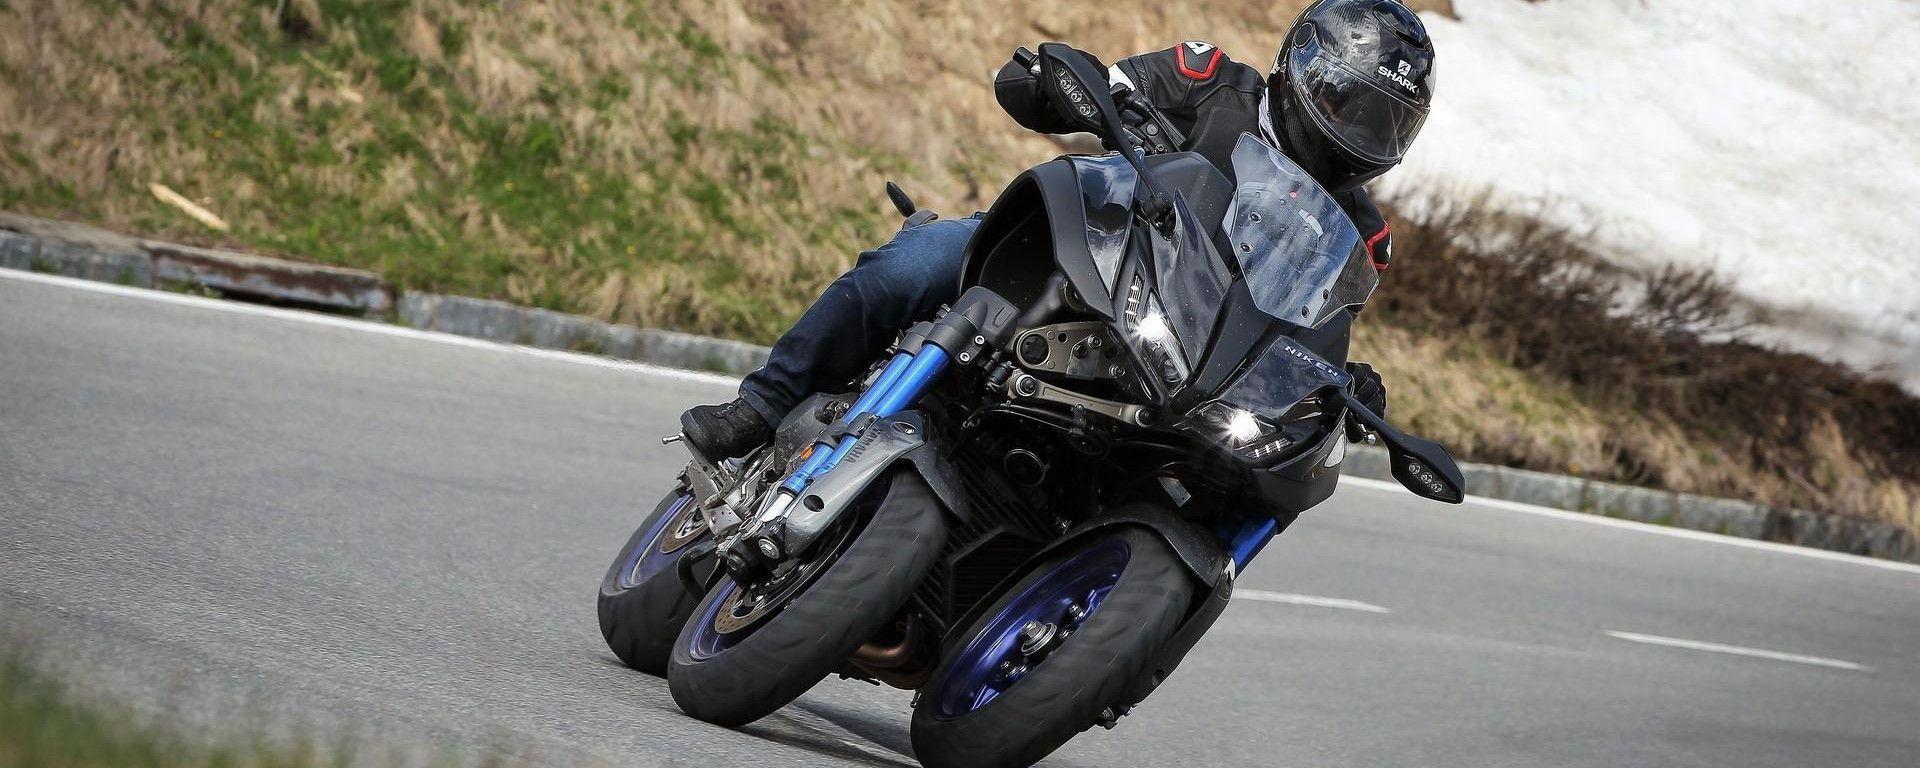 Yamaha Niken moto ufficiale di Giro, Tour e Vuelta di Spagna